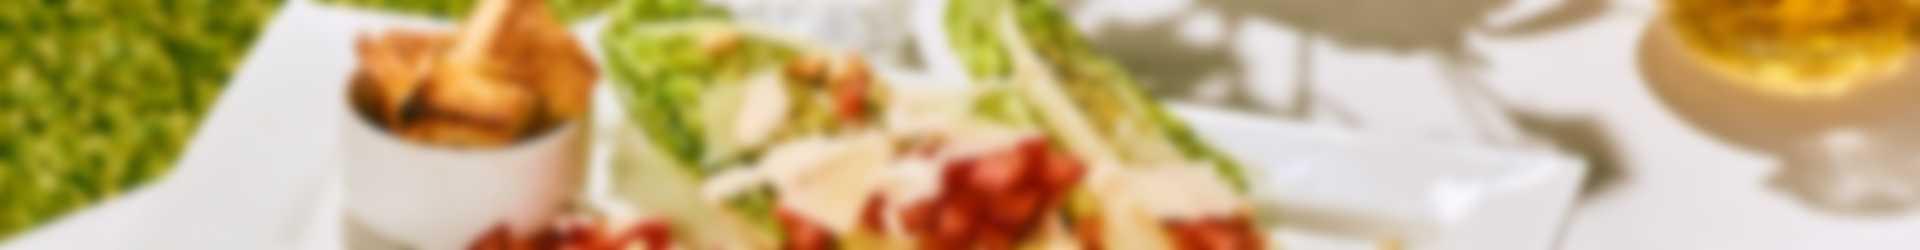 Gegrilde Romana - Caesar salade